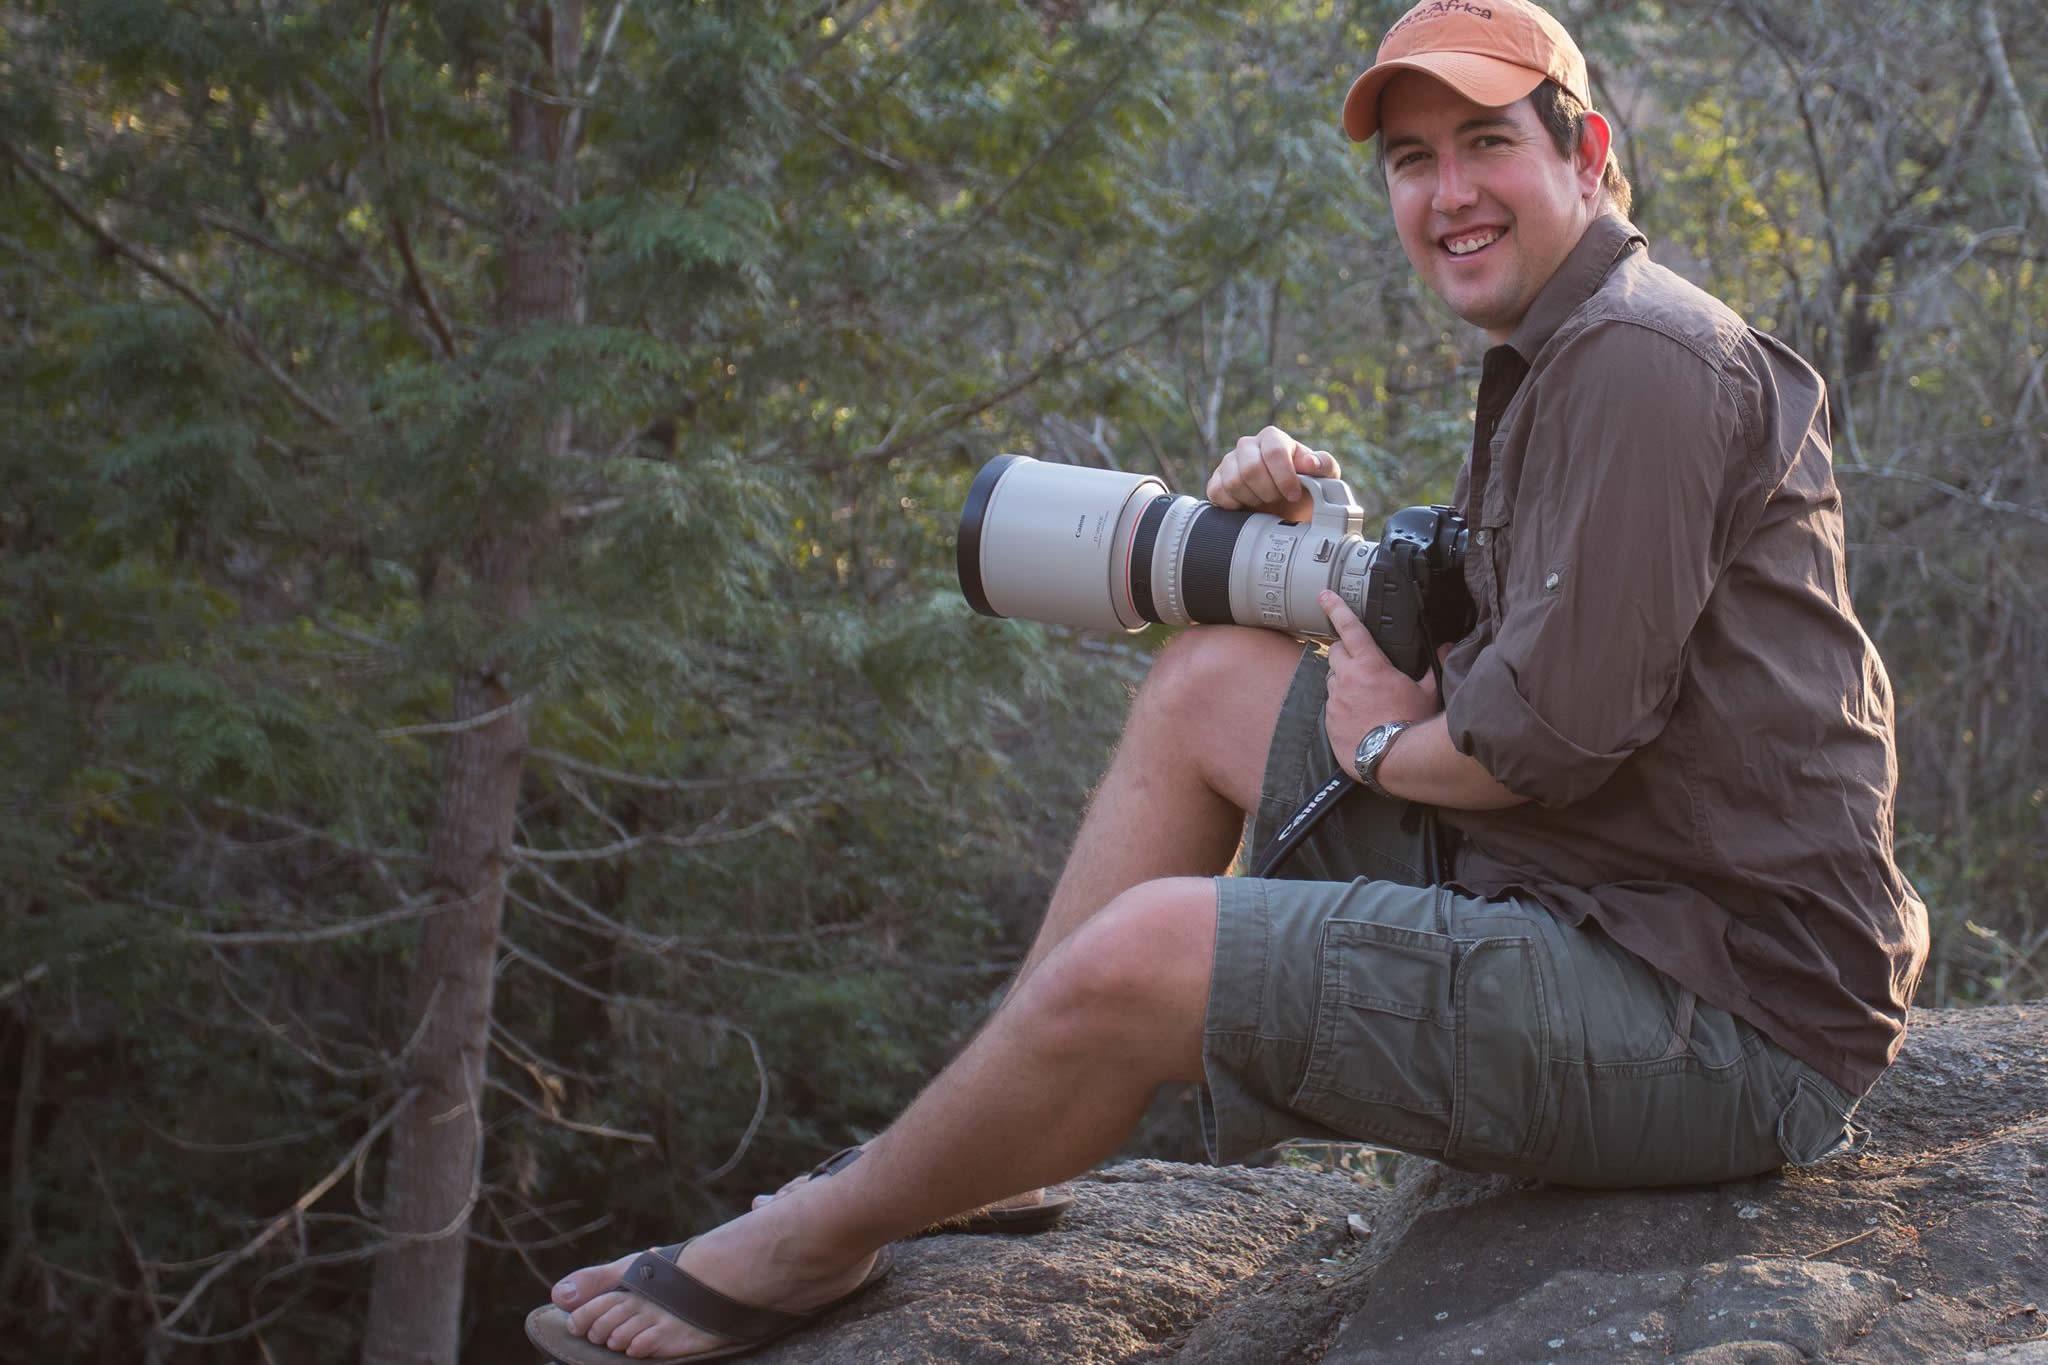 Johan Van Zyl, Professional Wildlife Photographer and Photography Safri Tour Guide in South Africa, Mpumalanga